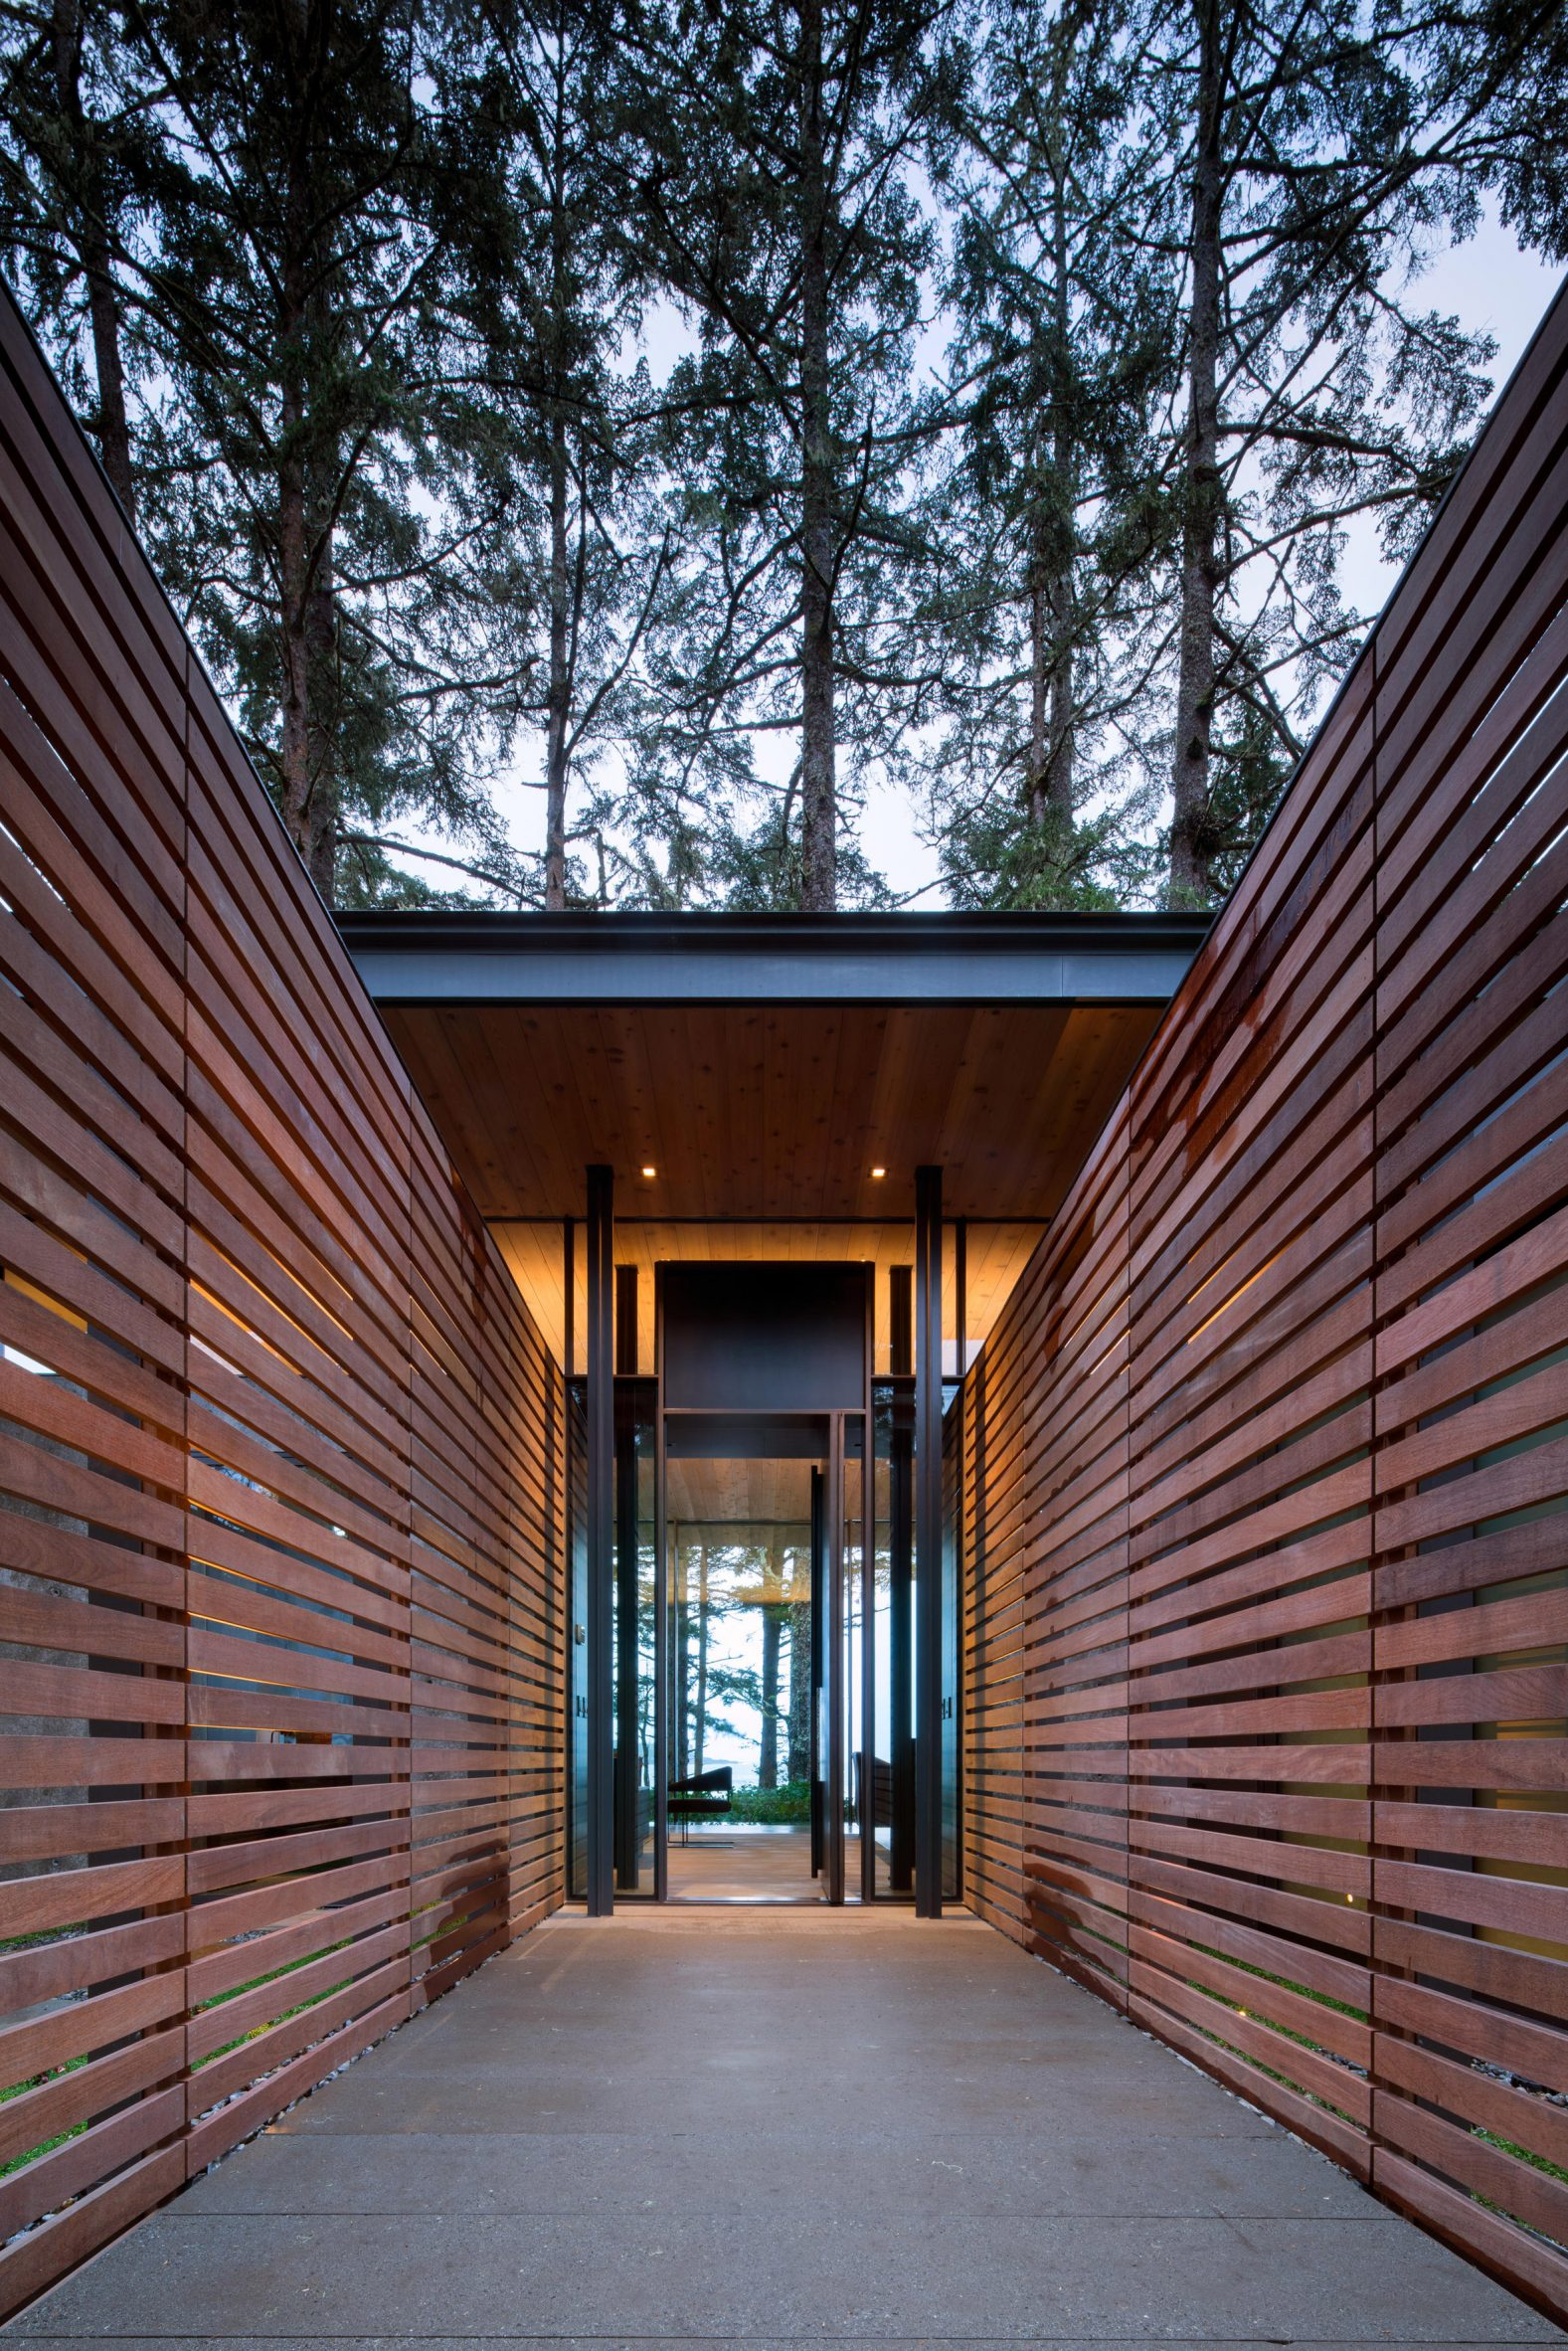 Wooden slats entrance to beach home Tofino Olson Kundig